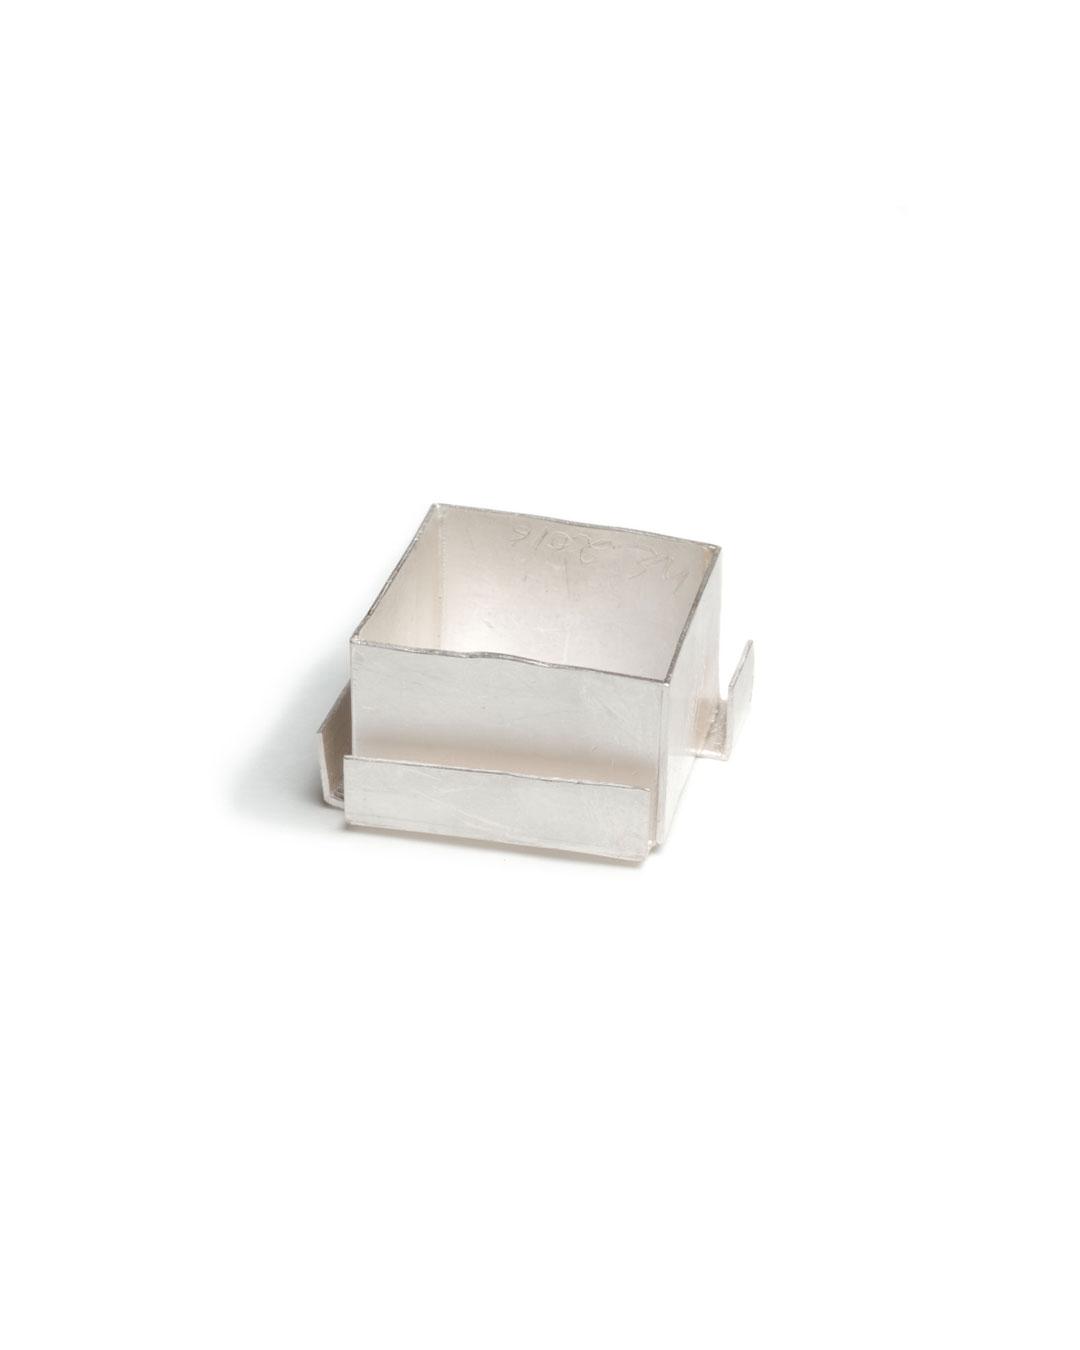 Noam Elyashiv, untitled, 2016, ring; reclaimed silver, 22 x 22 x 13 mm, €950